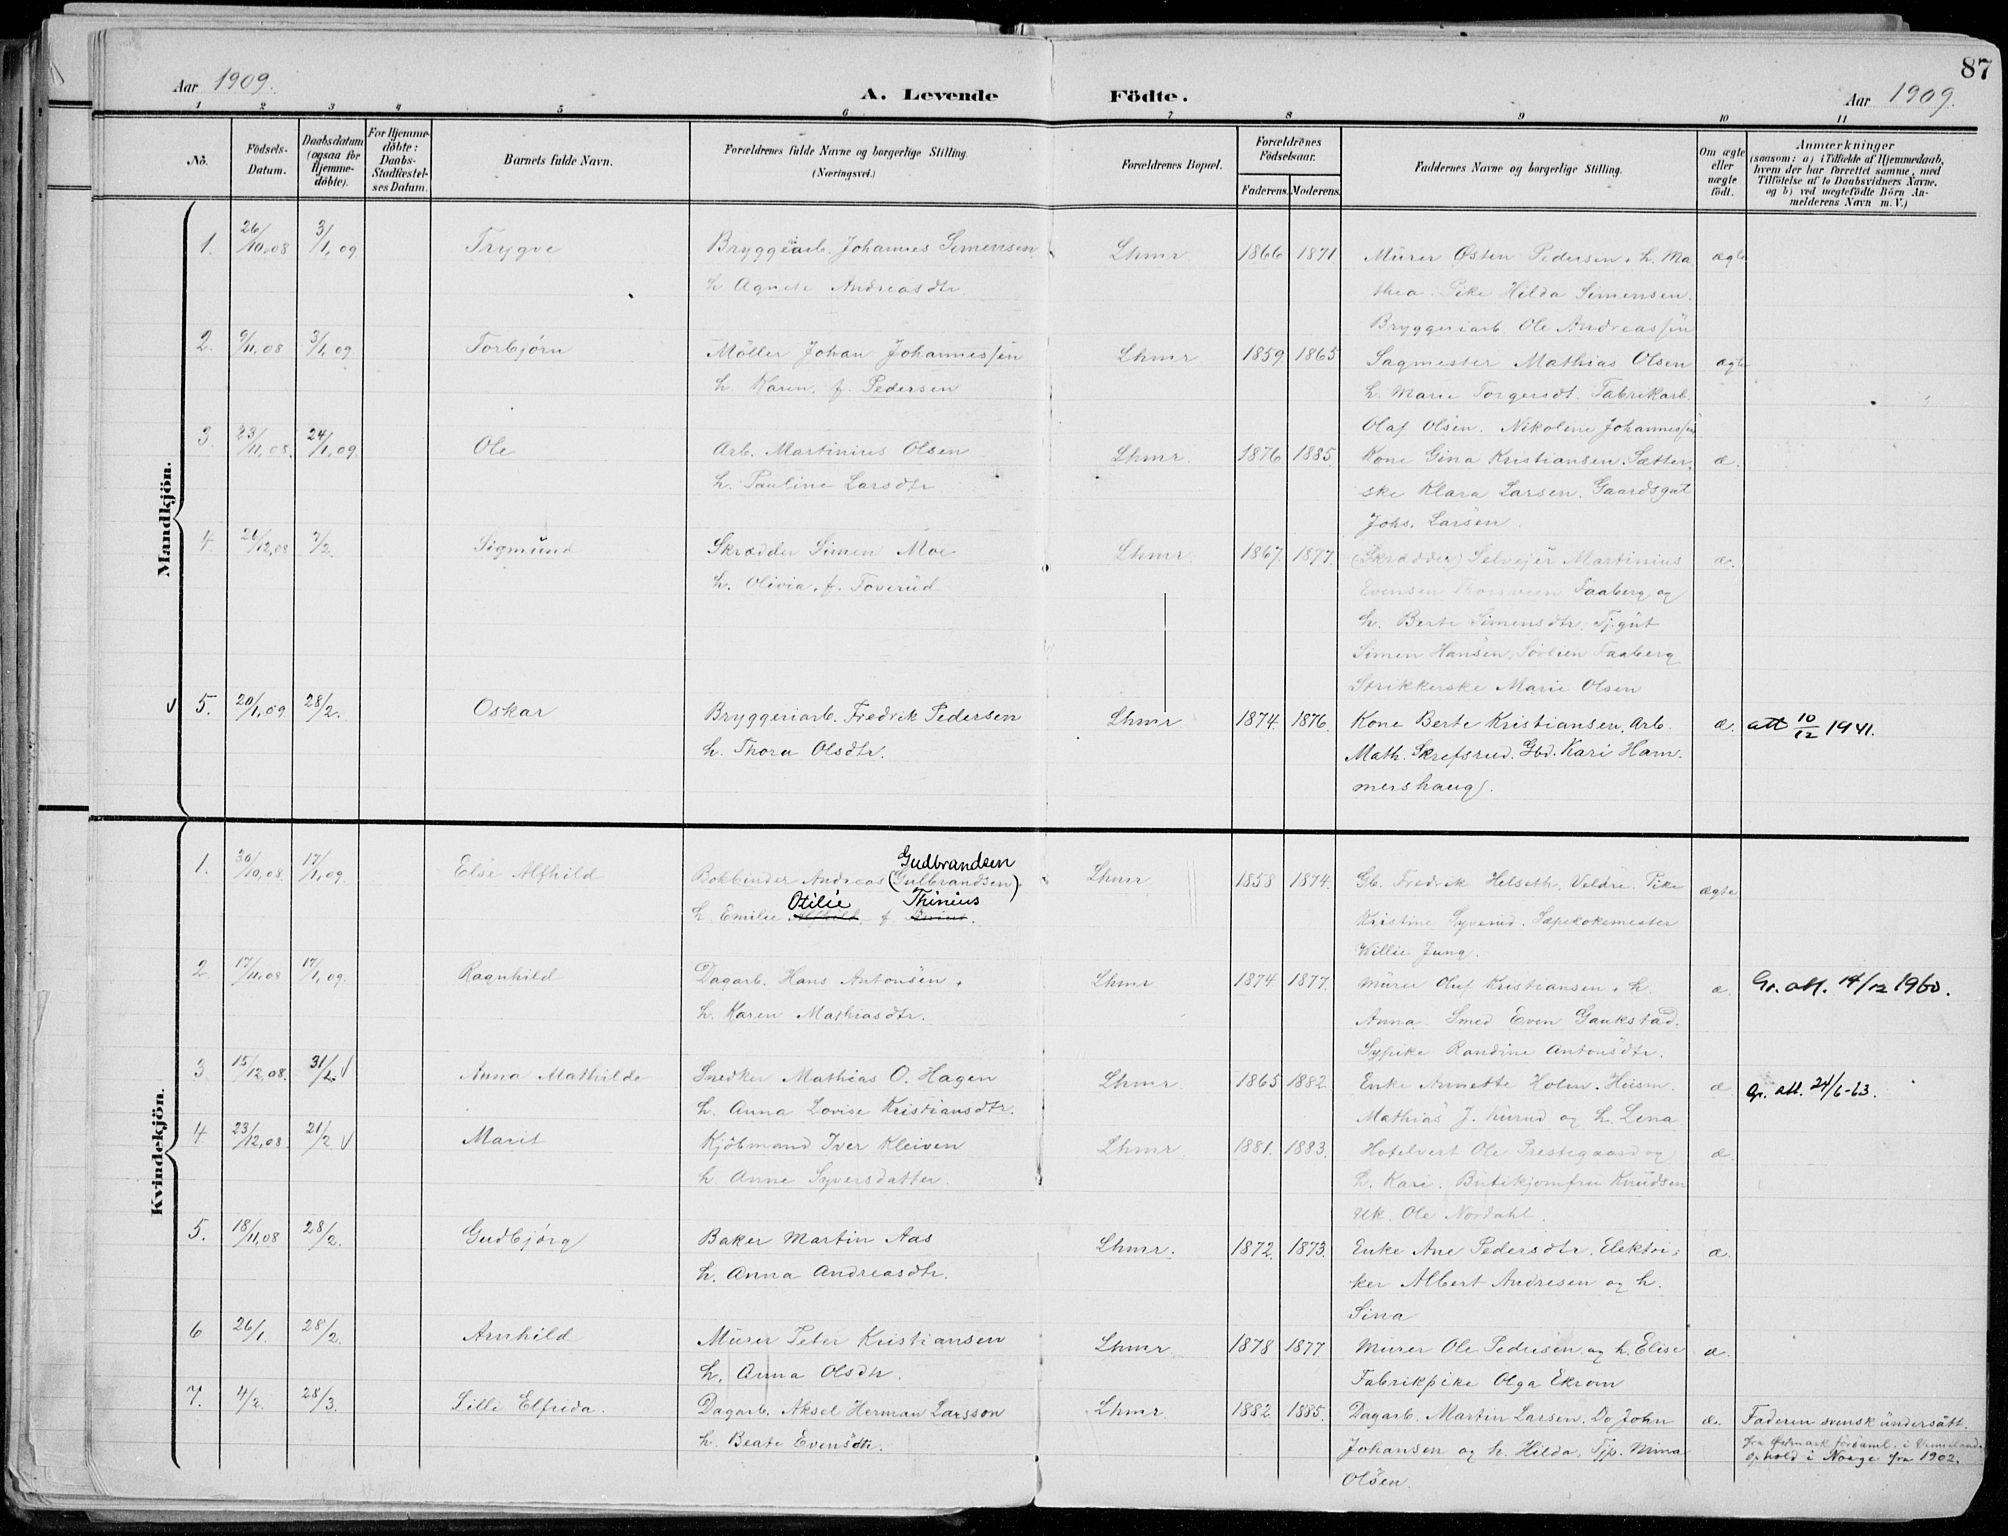 SAH, Lillehammer prestekontor, Ministerialbok nr. 1, 1901-1916, s. 87